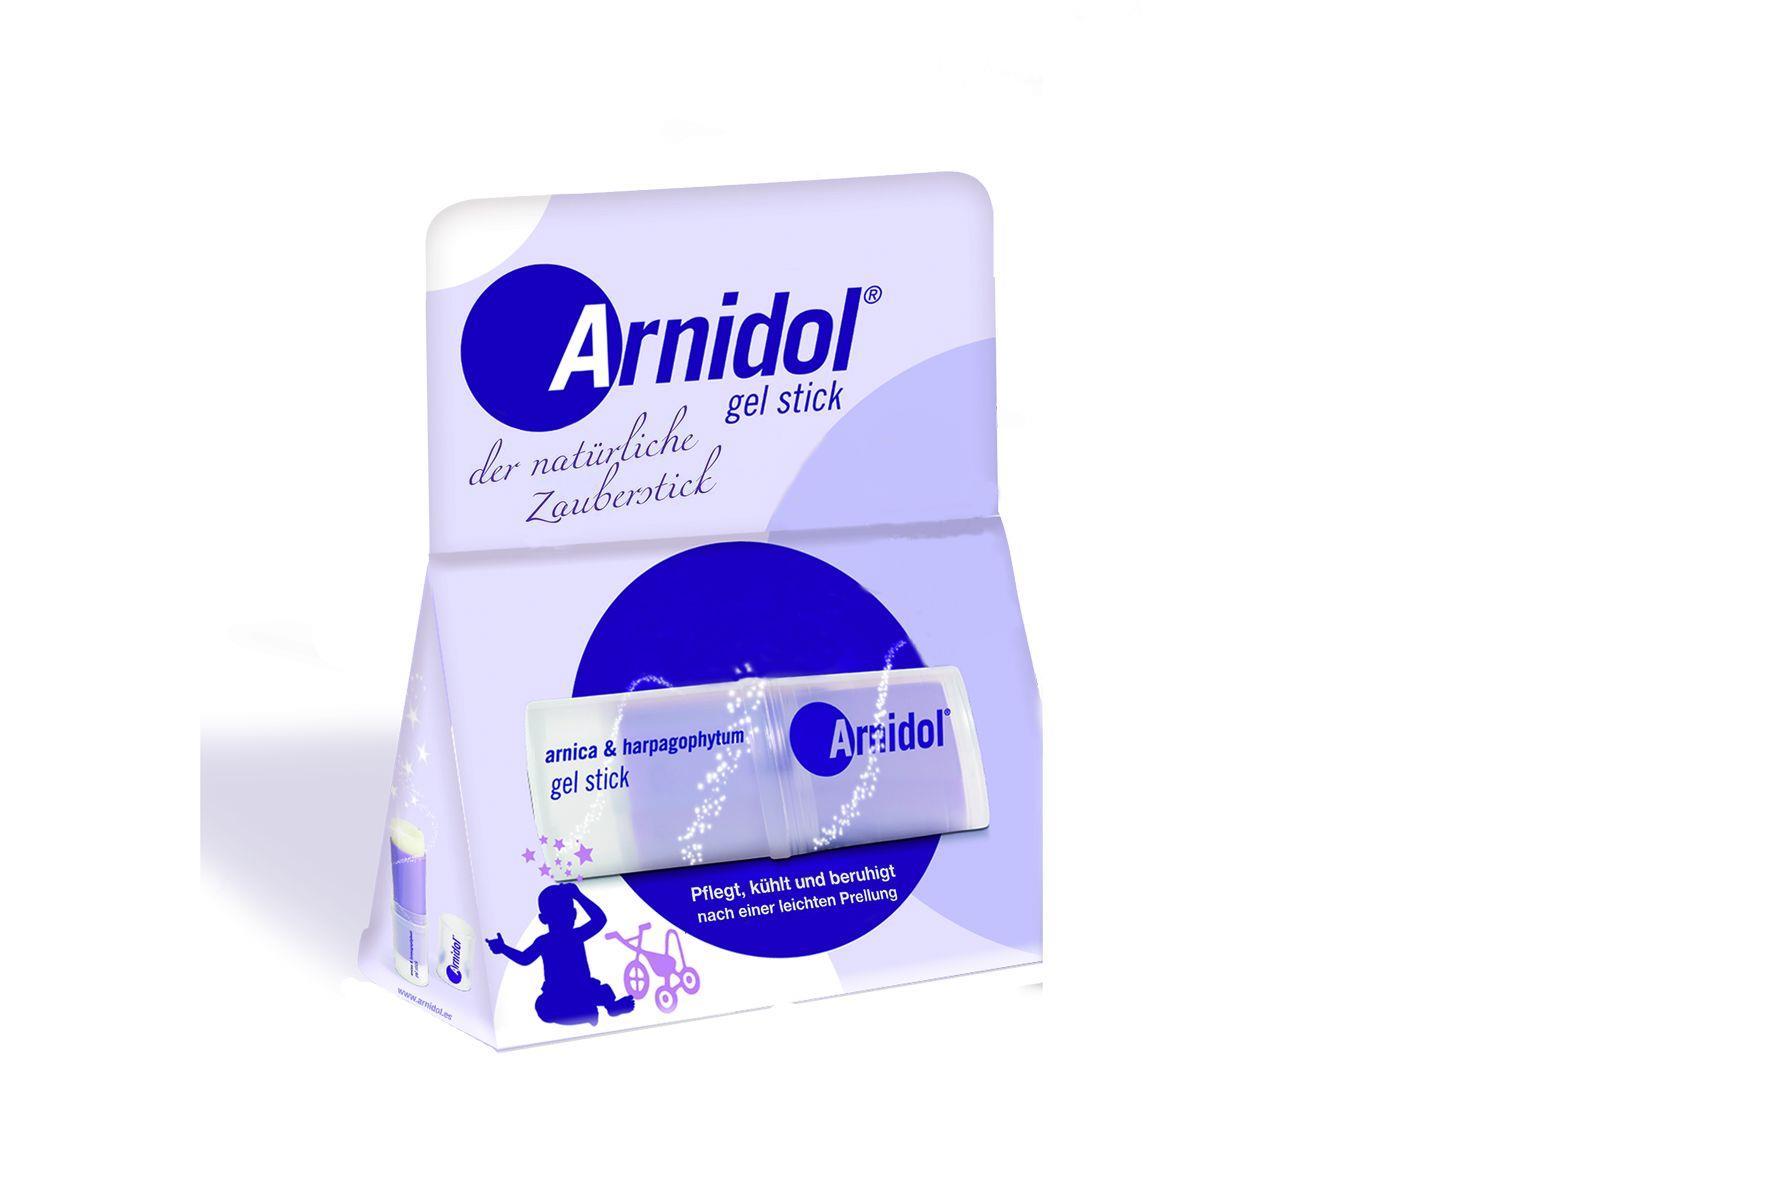 Arnidol Gel Stick